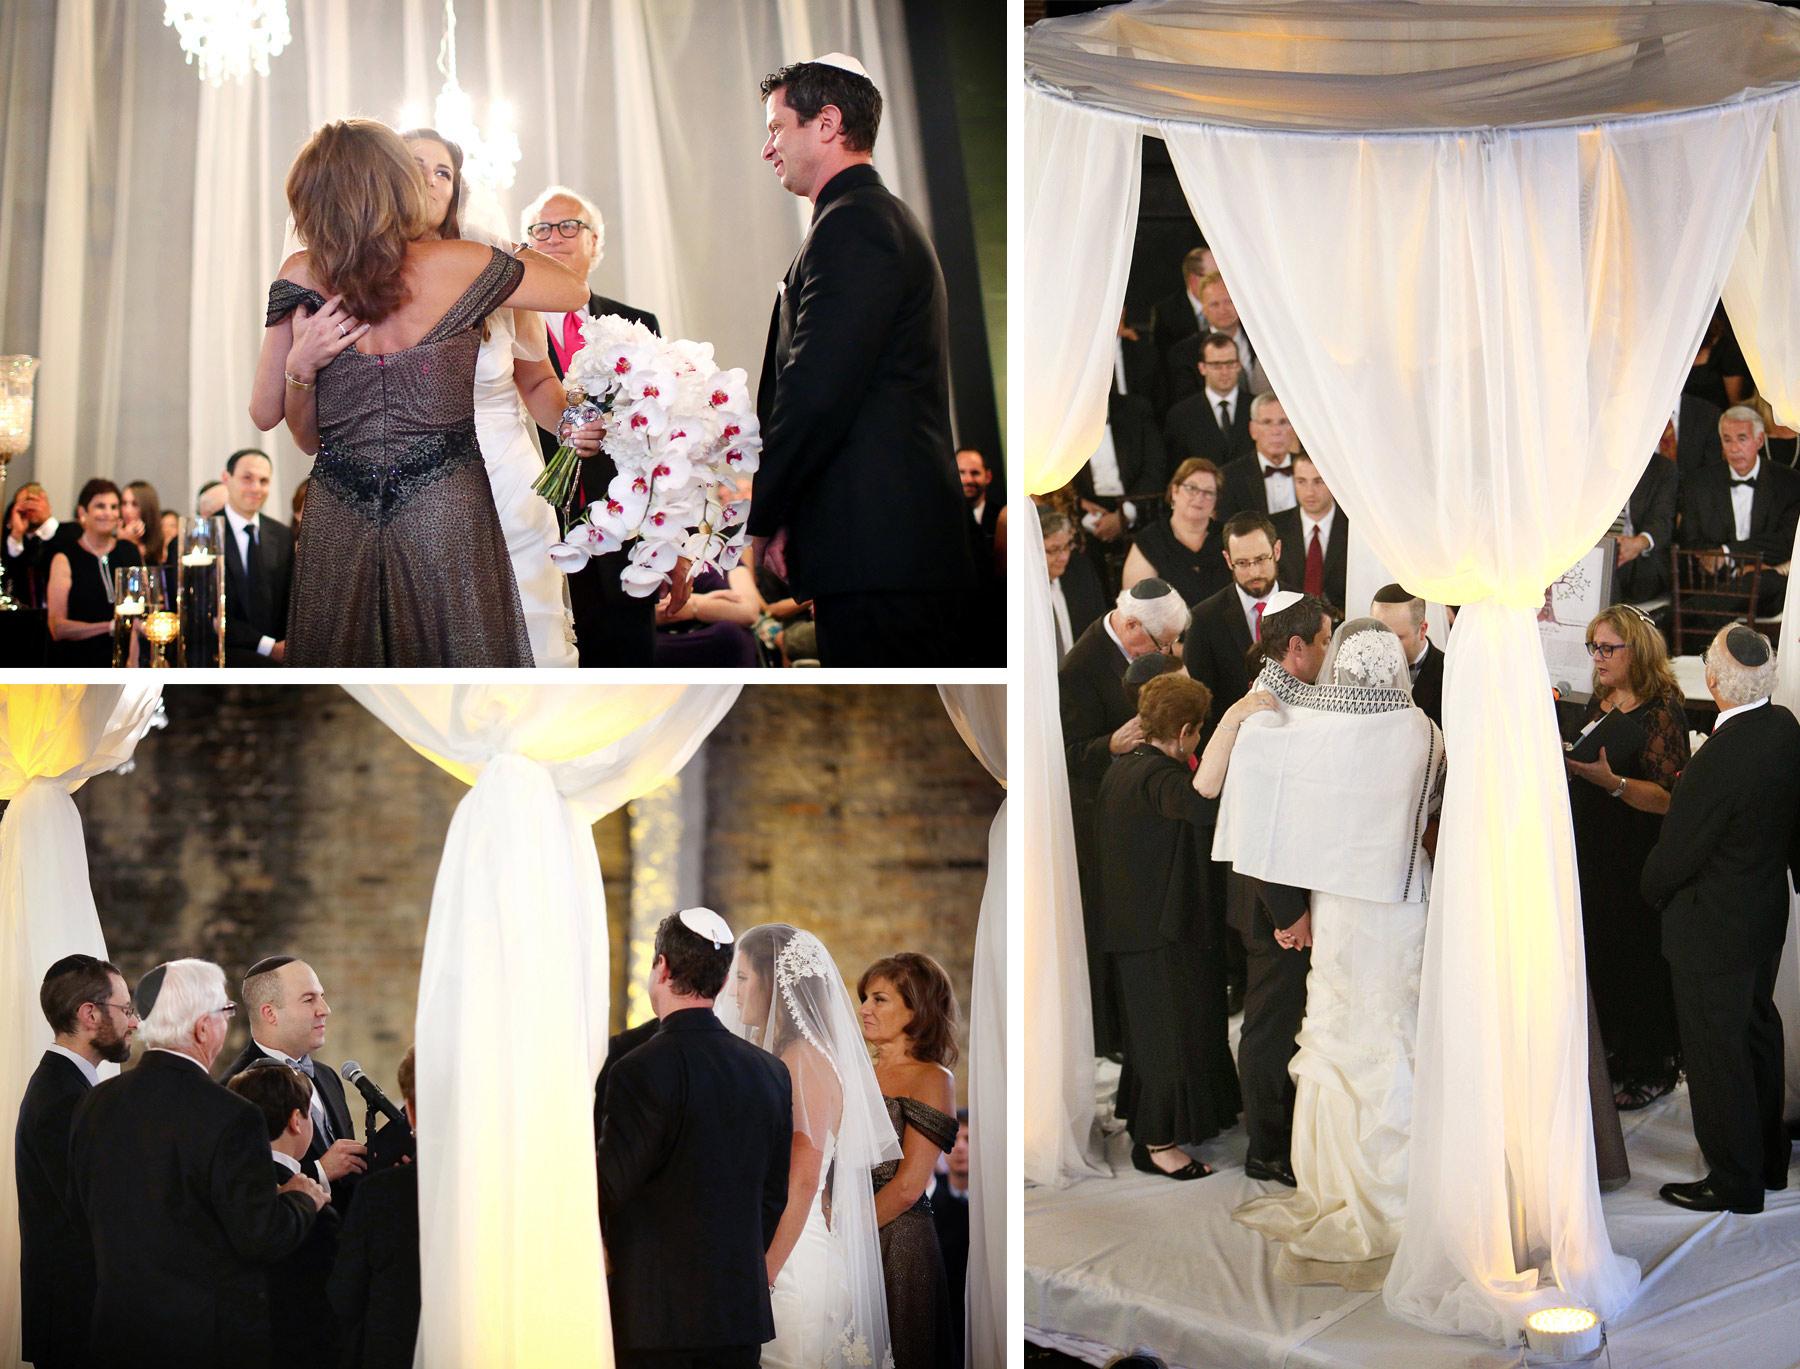 09-Minneapolis-Minnesota-Wedding-Photography-by-Vick-Photography-Aria-Downtown-Ceremony-Layne-&-Dan.jpg